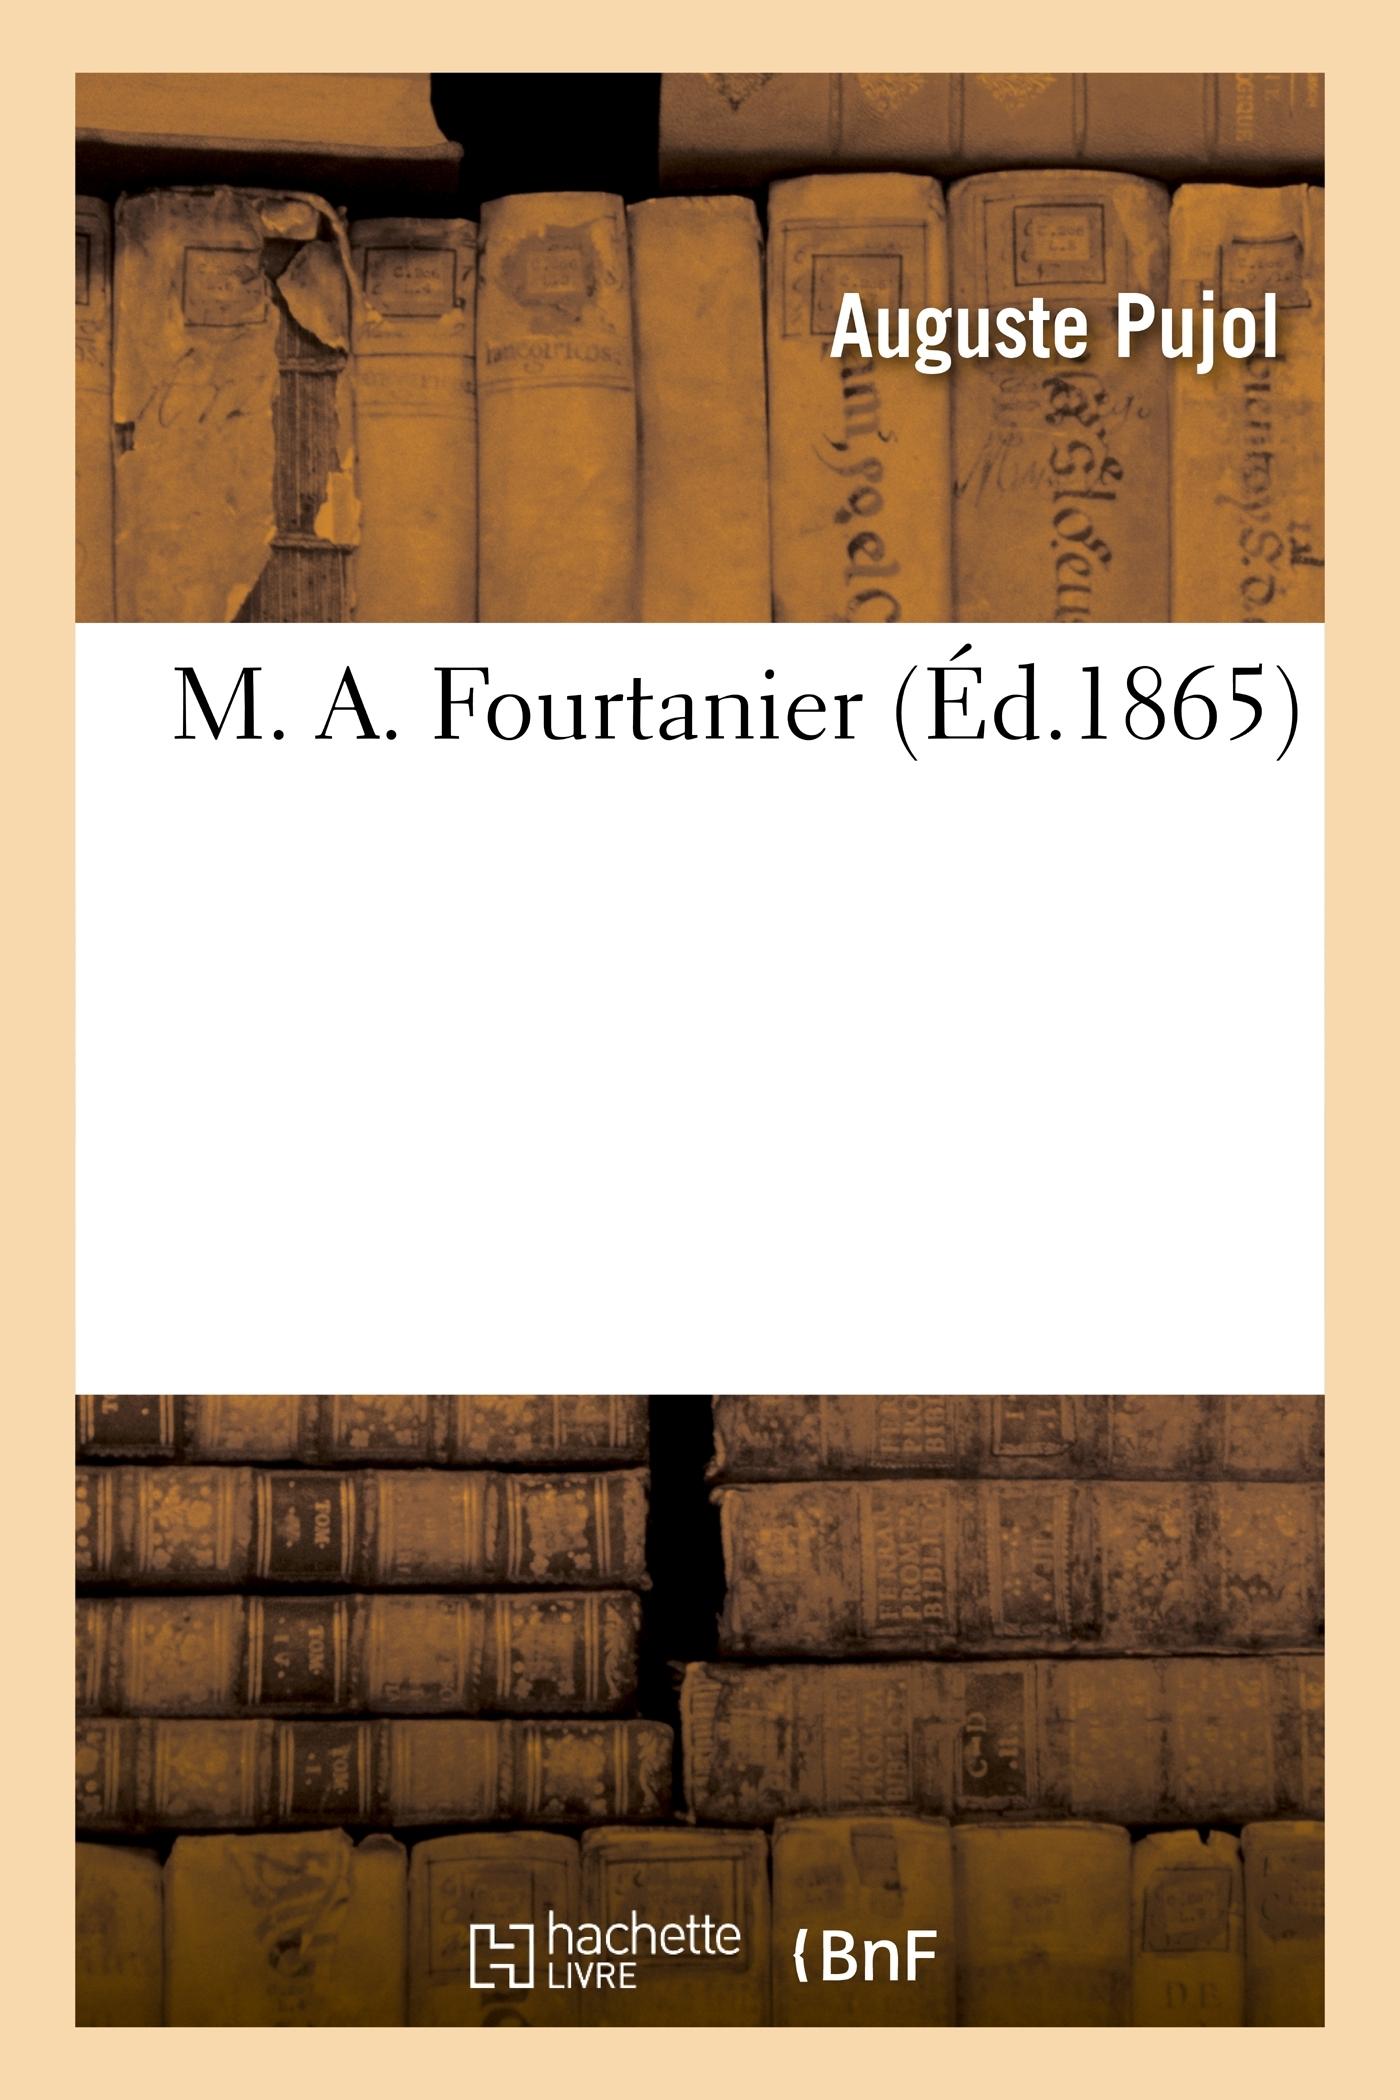 M. A. FOURTANIER